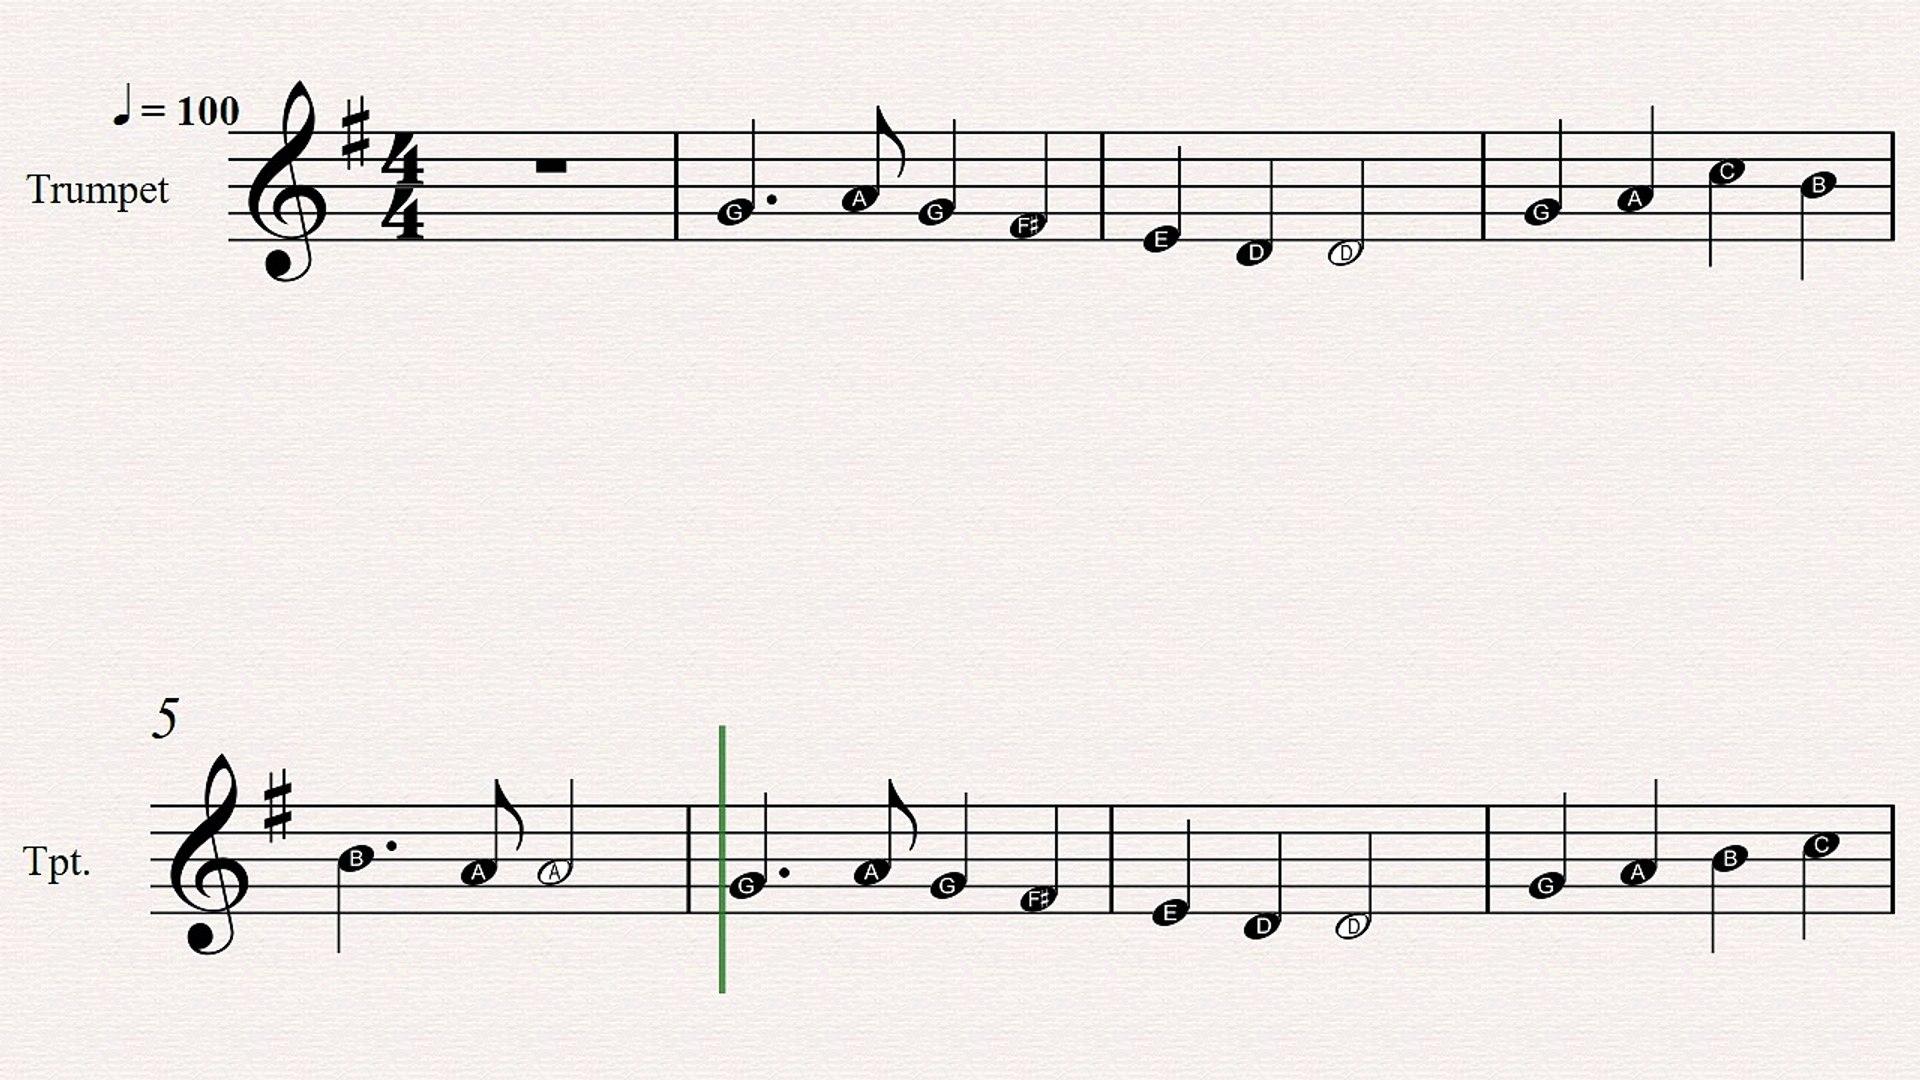 Dashing Through The Snow Piano Sheet Music Free - Best Music Sheet